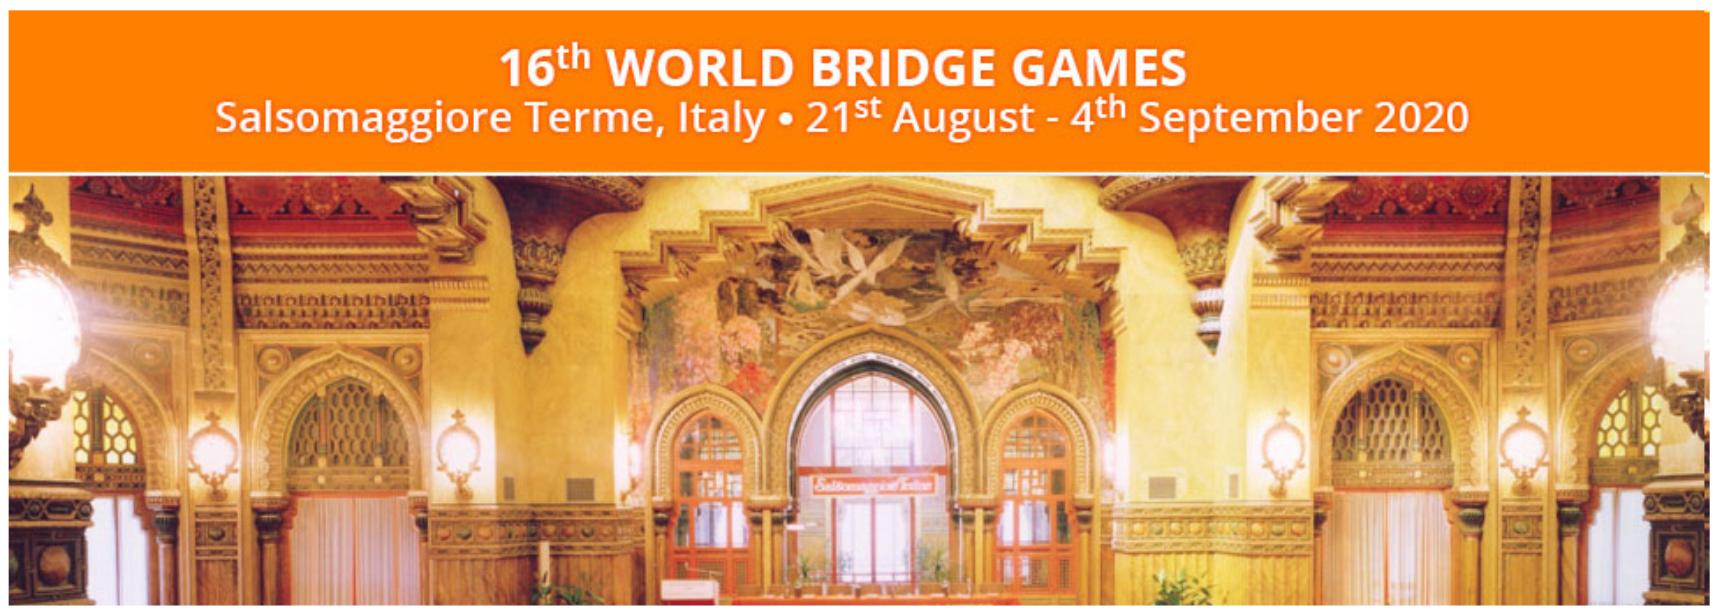 2020 World Bridge Games